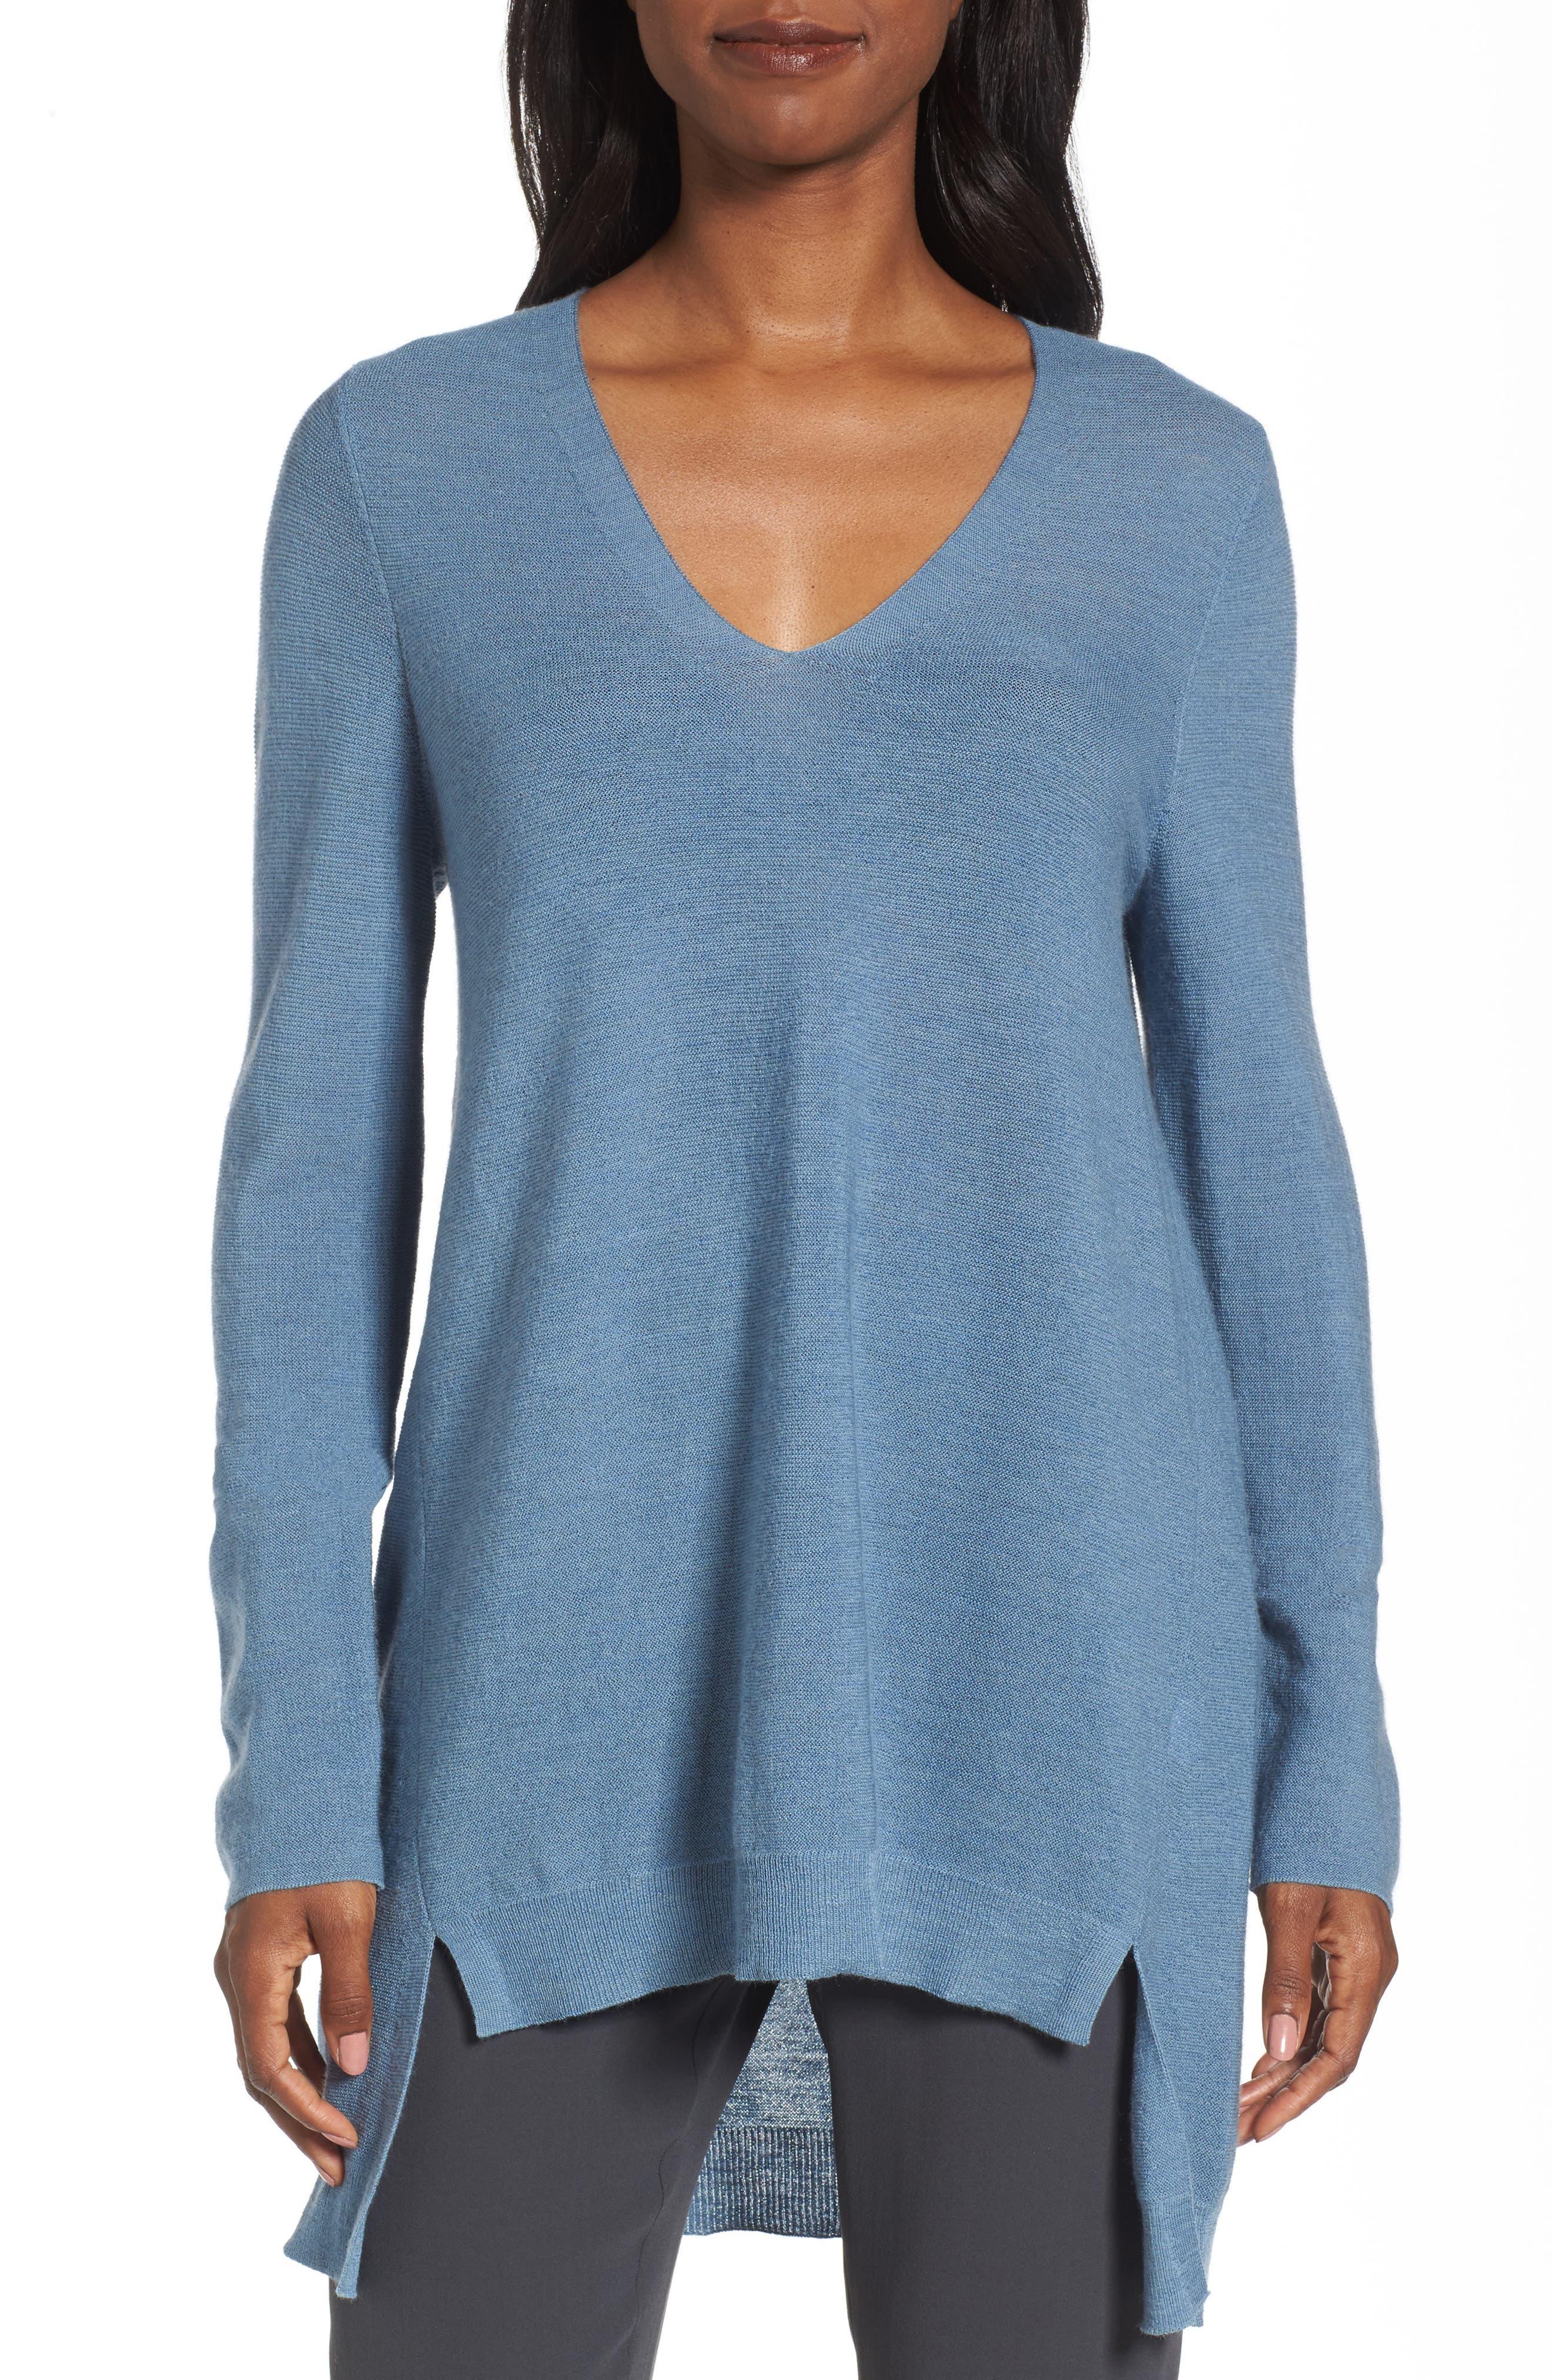 Alternate Image 1 Selected - Eileen Fisher High/Low Merino Wool Sweater